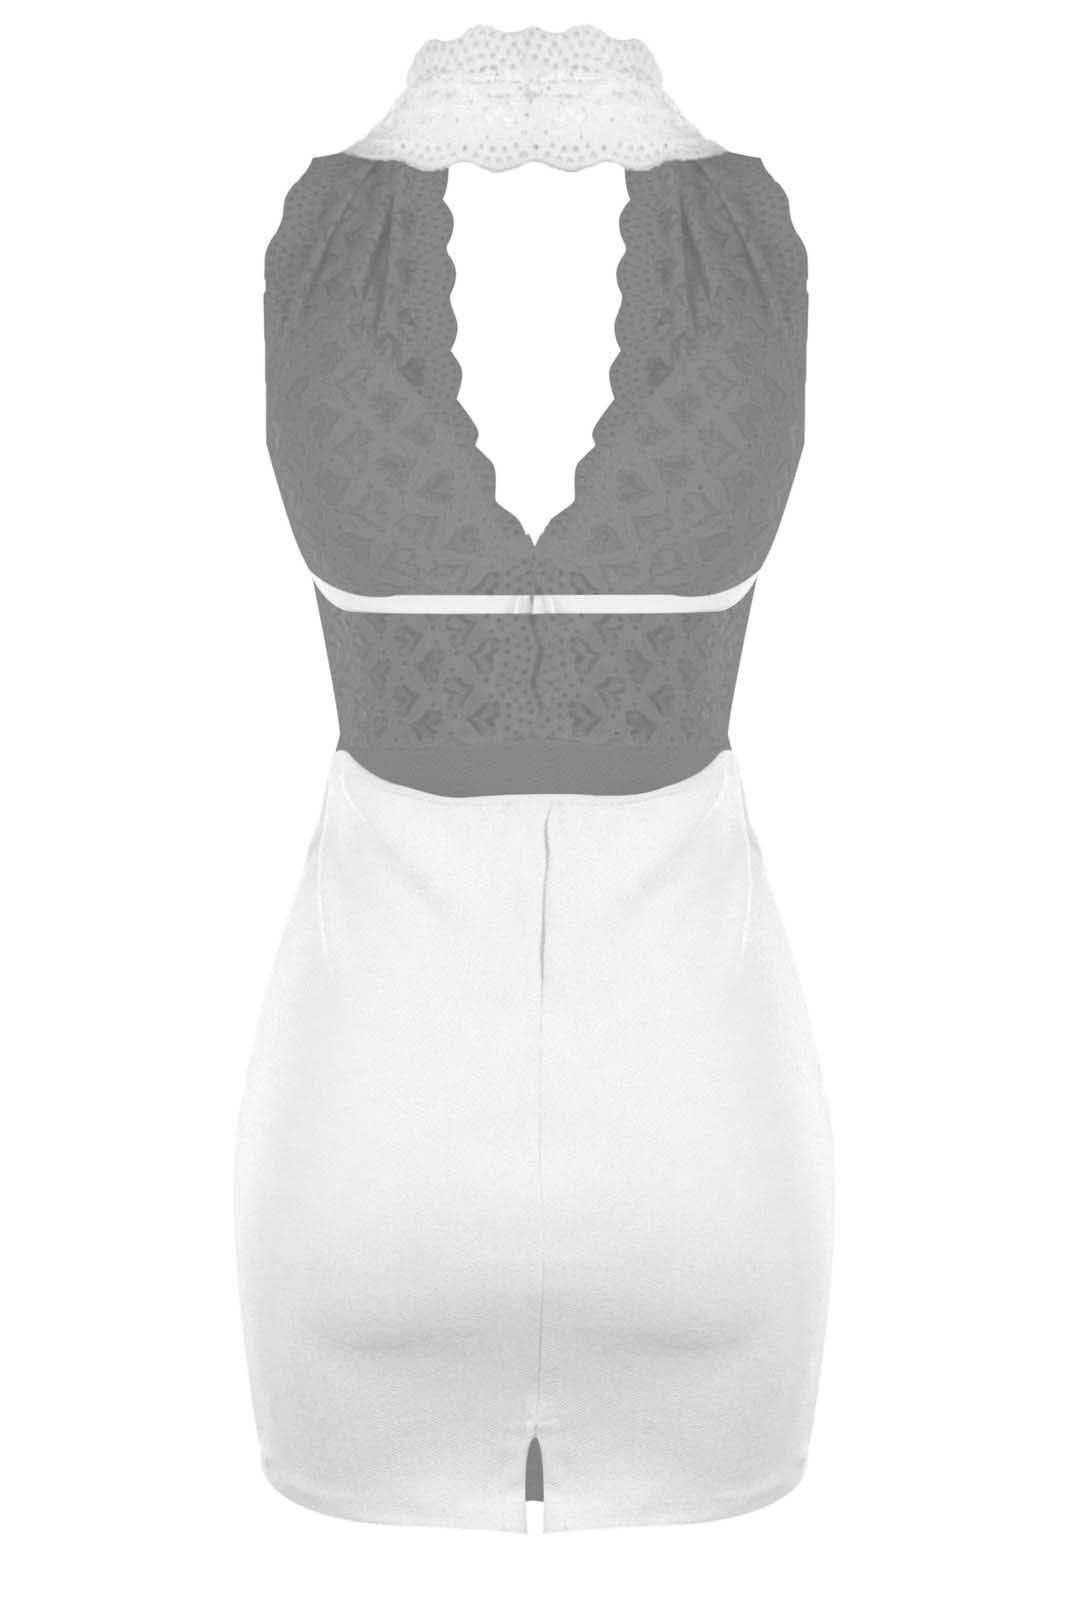 Vestido Outlet Dri Curto Frente Única Decote Decotado Costa Nua Renda Branco